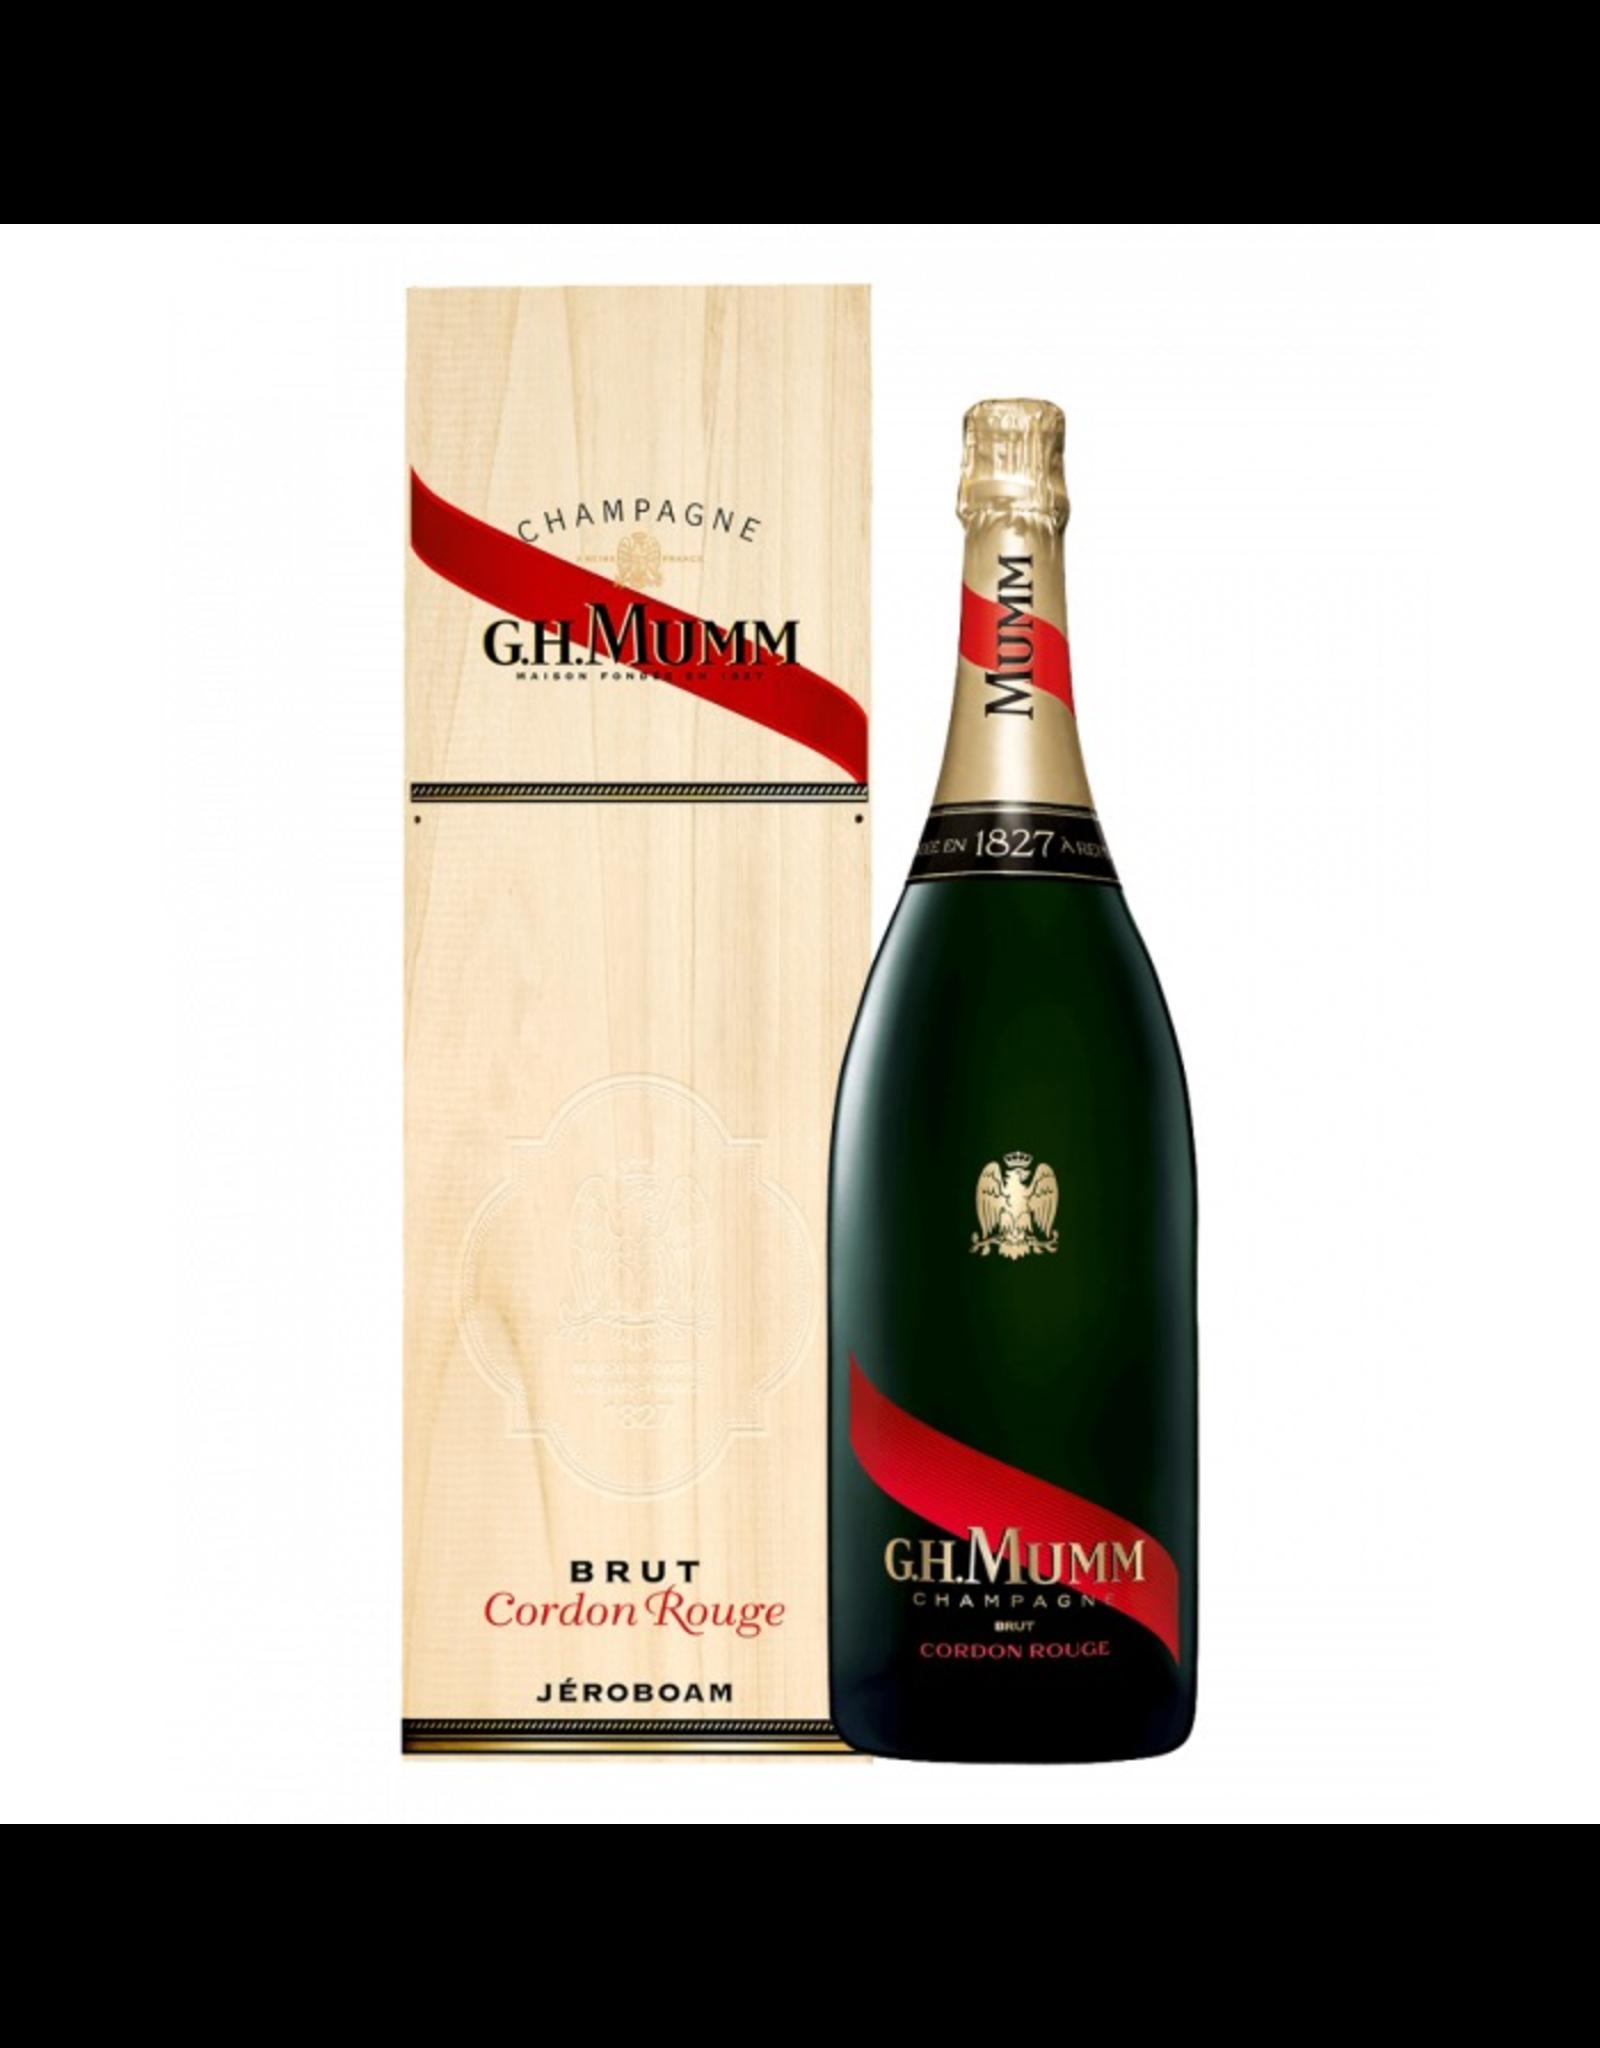 Sparkling Wine NV, G.H. Mumm Cordon Rouge Brut 3 Liter Doubble-Magnum Jeroboam, Champagne, Reims, Champage, France, 12% Alc, CT89